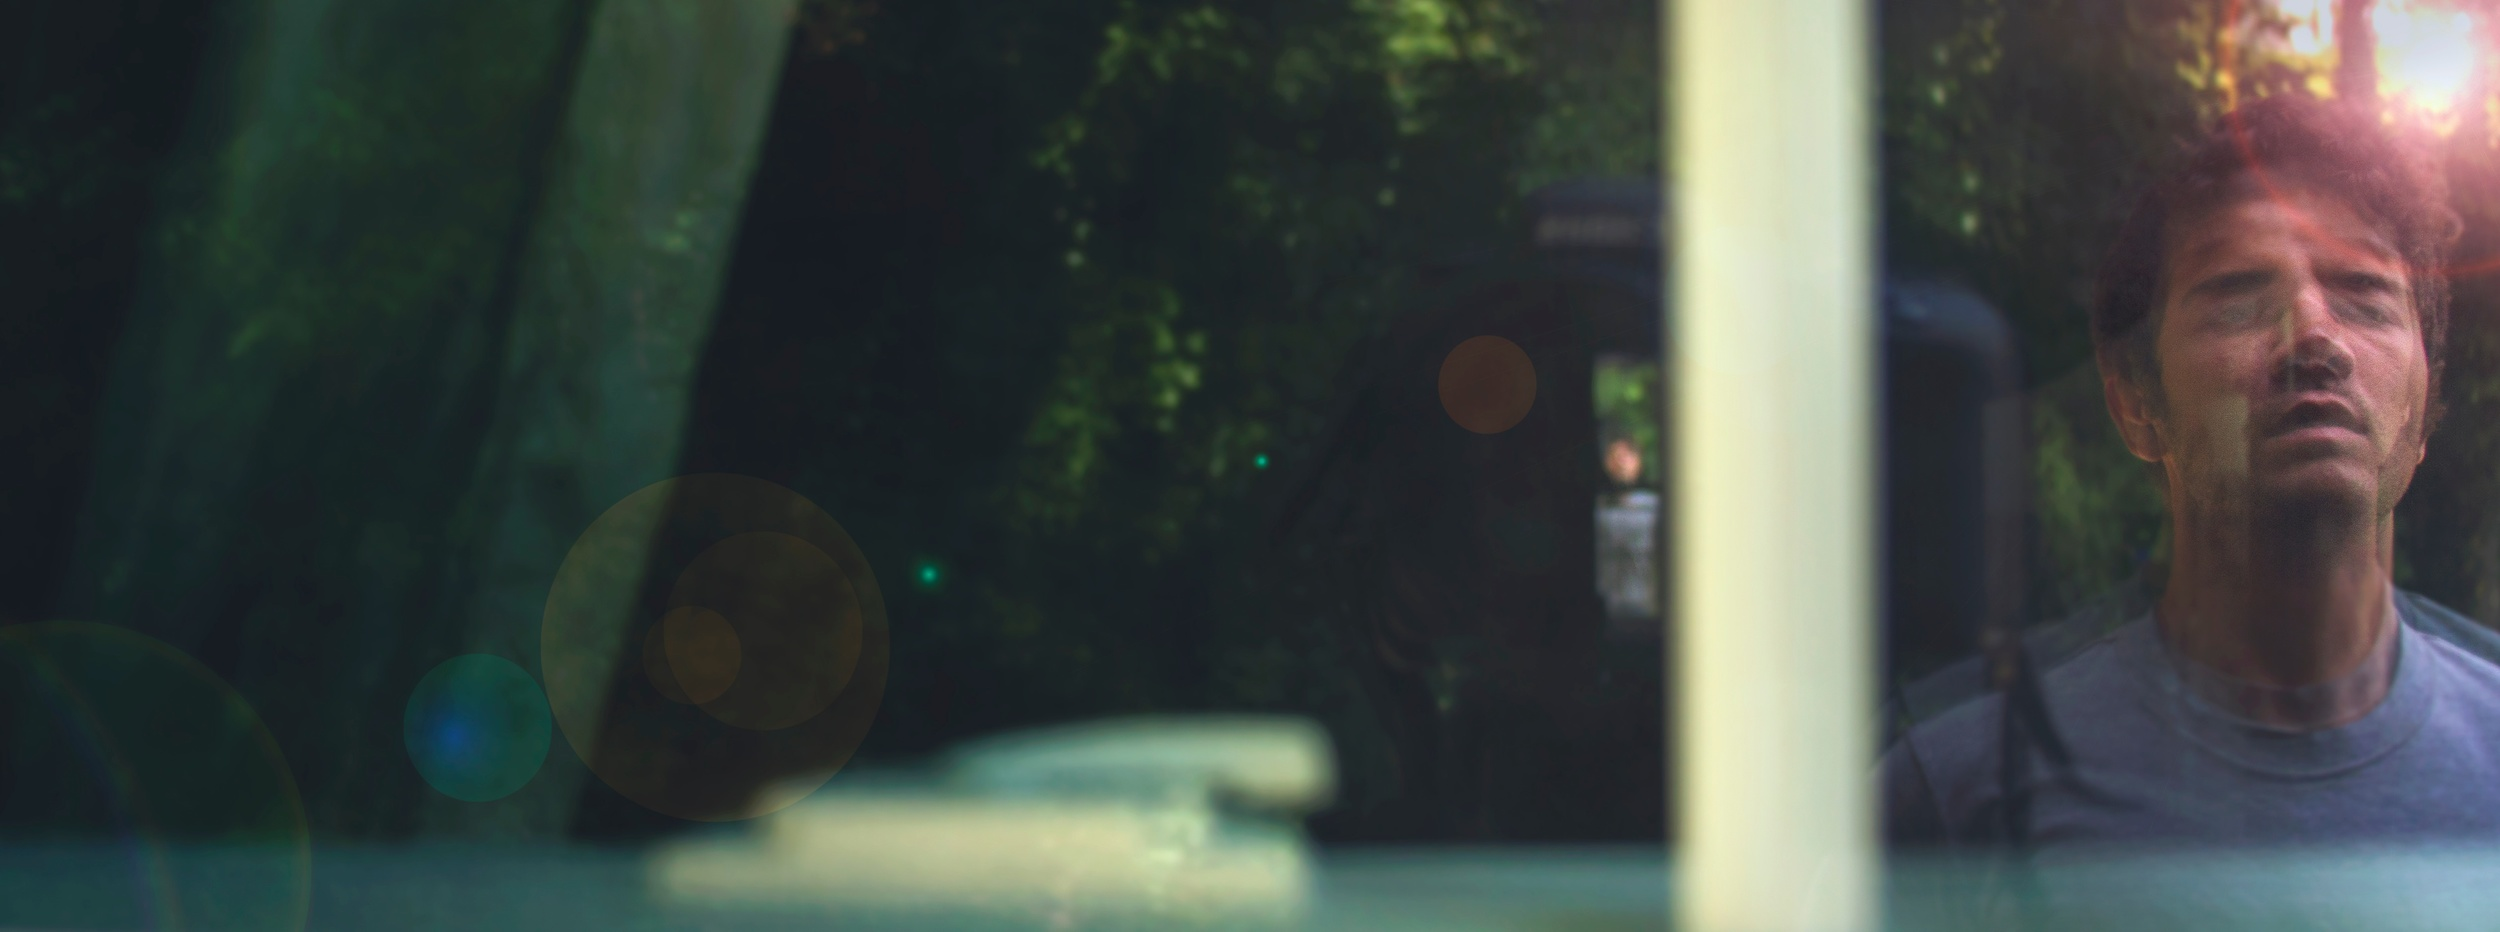 window_reflection_flare_face.jpg